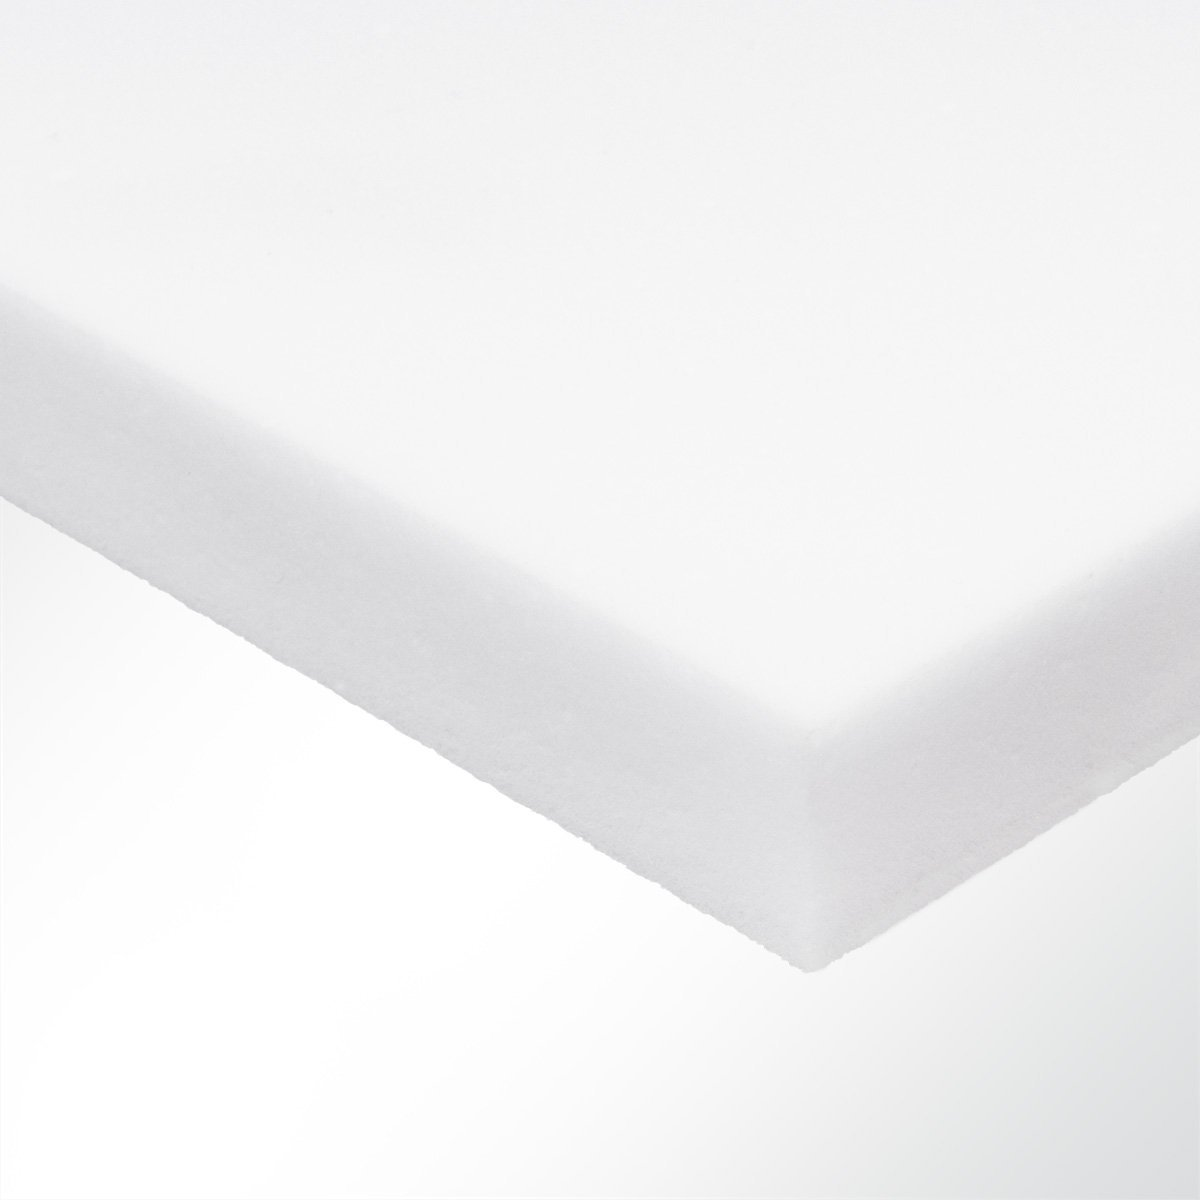 Basotect® Schall Absorber Schaumstoff Schalldämmung Schallschutz Raumakustik 500x20x1000mm Weiß